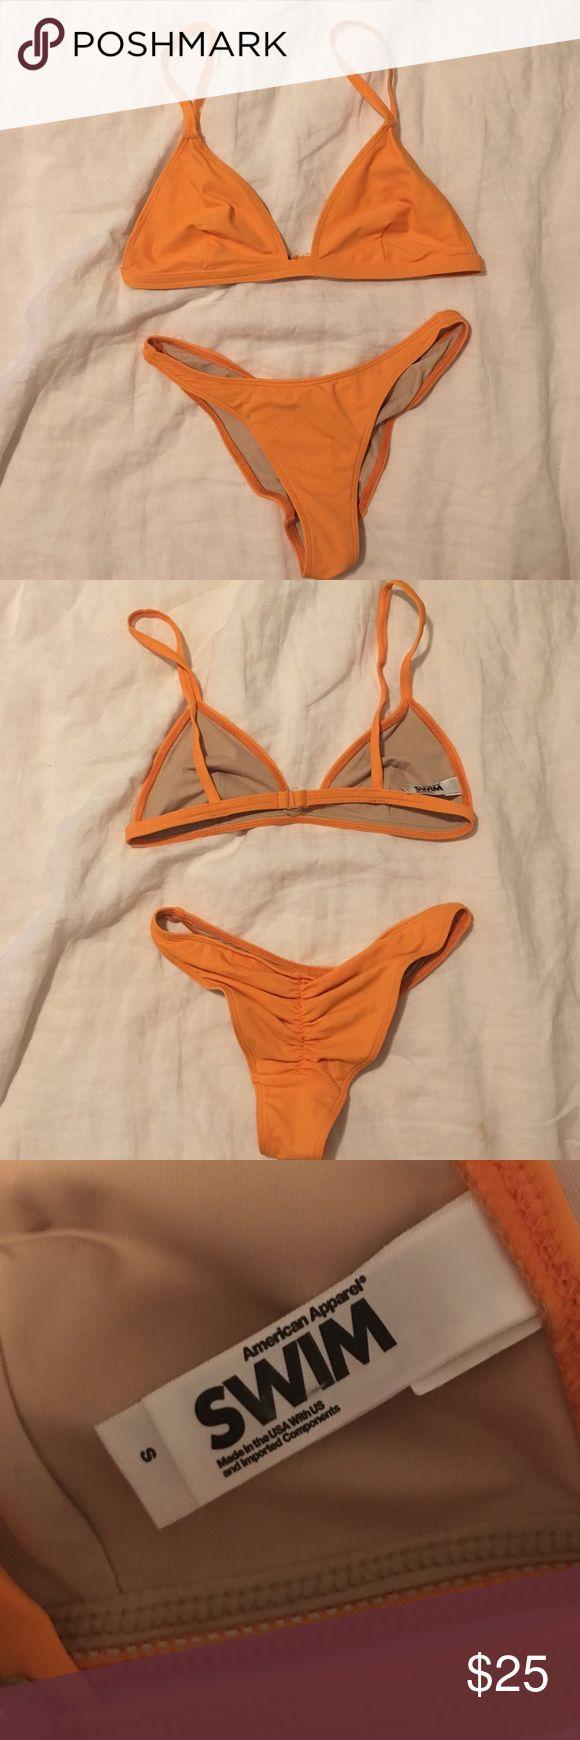 American apparel orange bikini Size small orange bikini from American apparel. Never worn, tried on once, washed. True to size. Final price, NO BIDS American Apparel Swim Bikinis